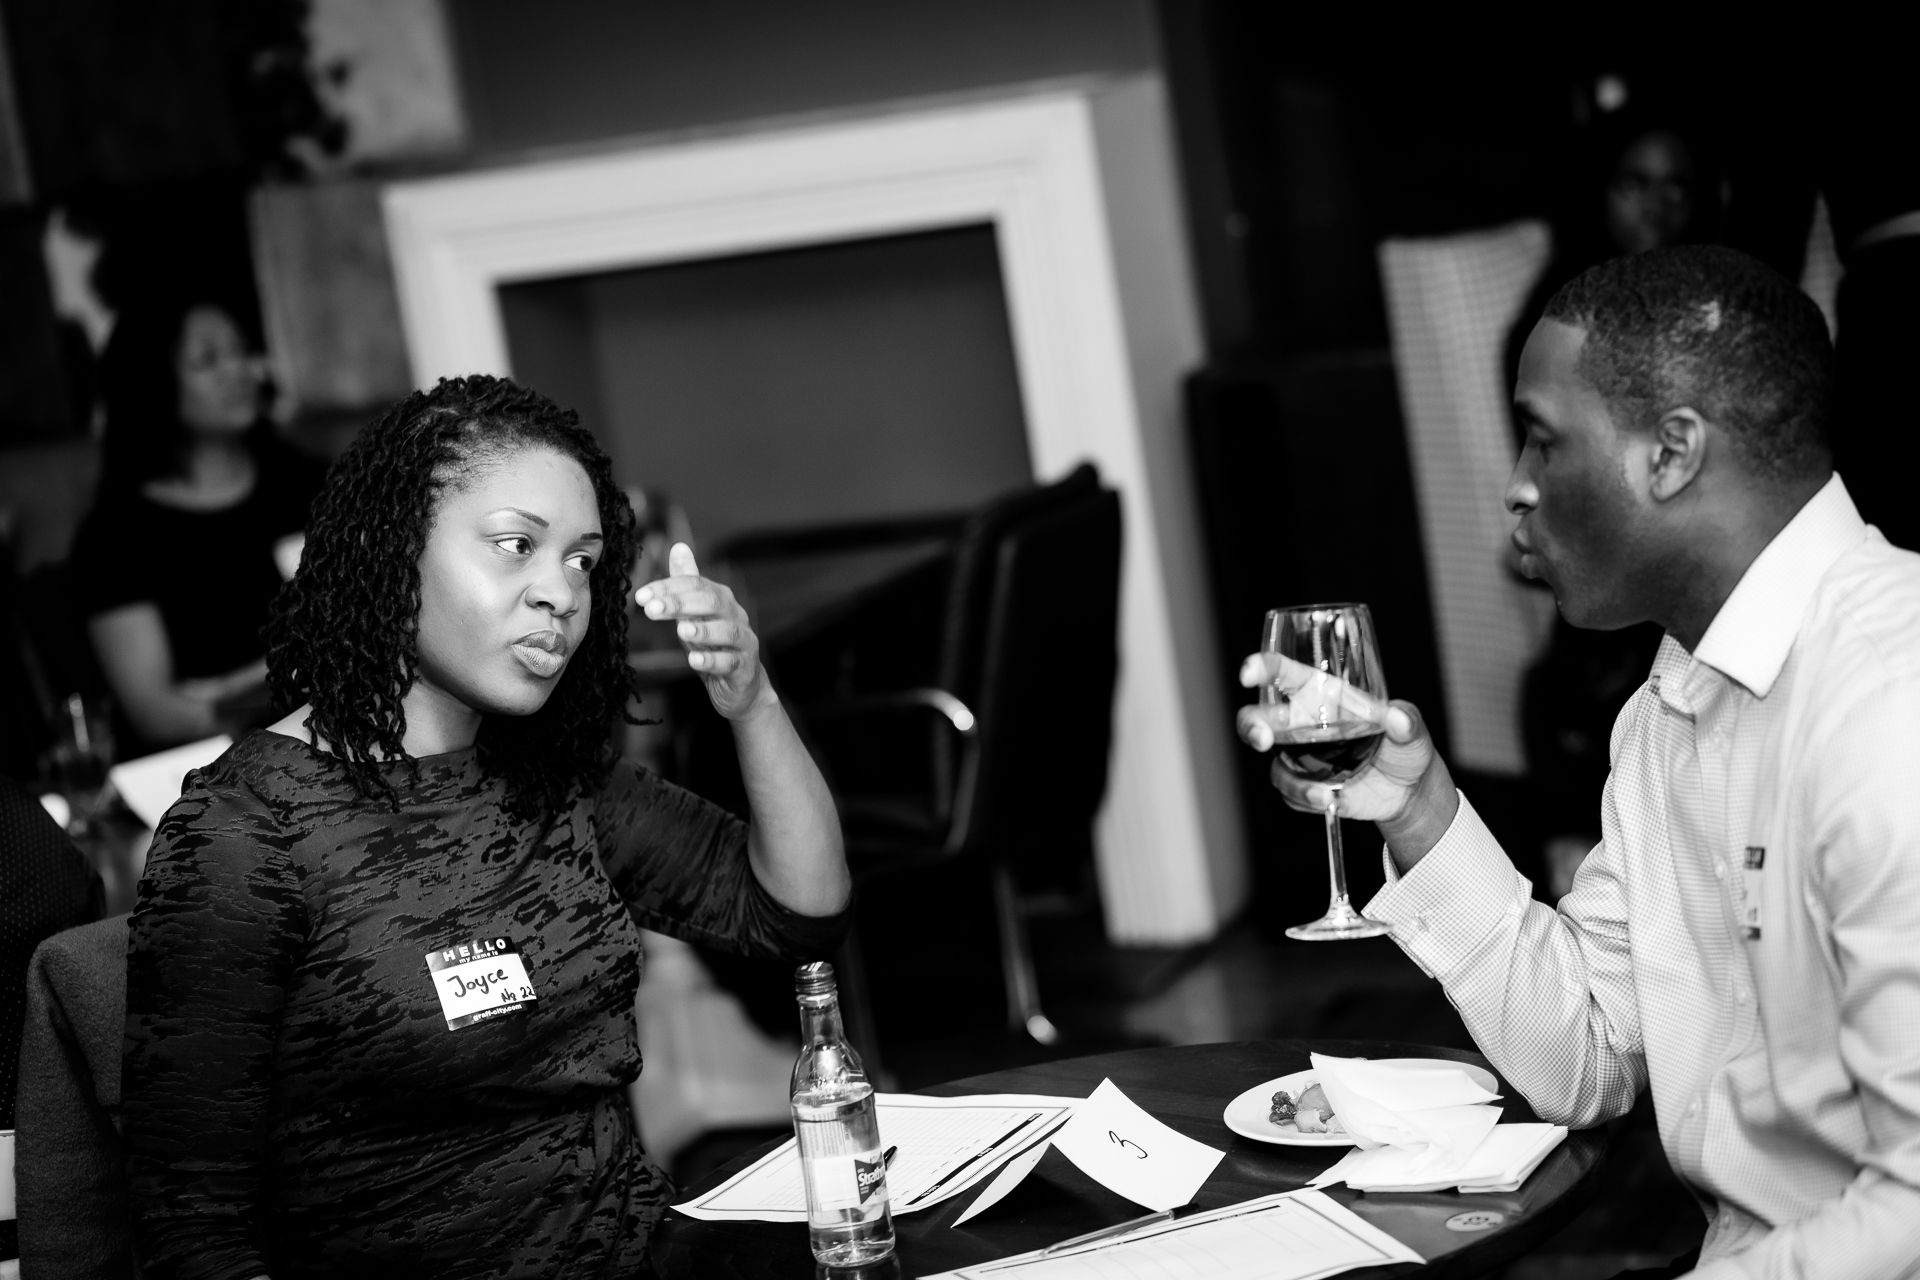 Take Your Steps Forward To Date Black Singles At Vibeline